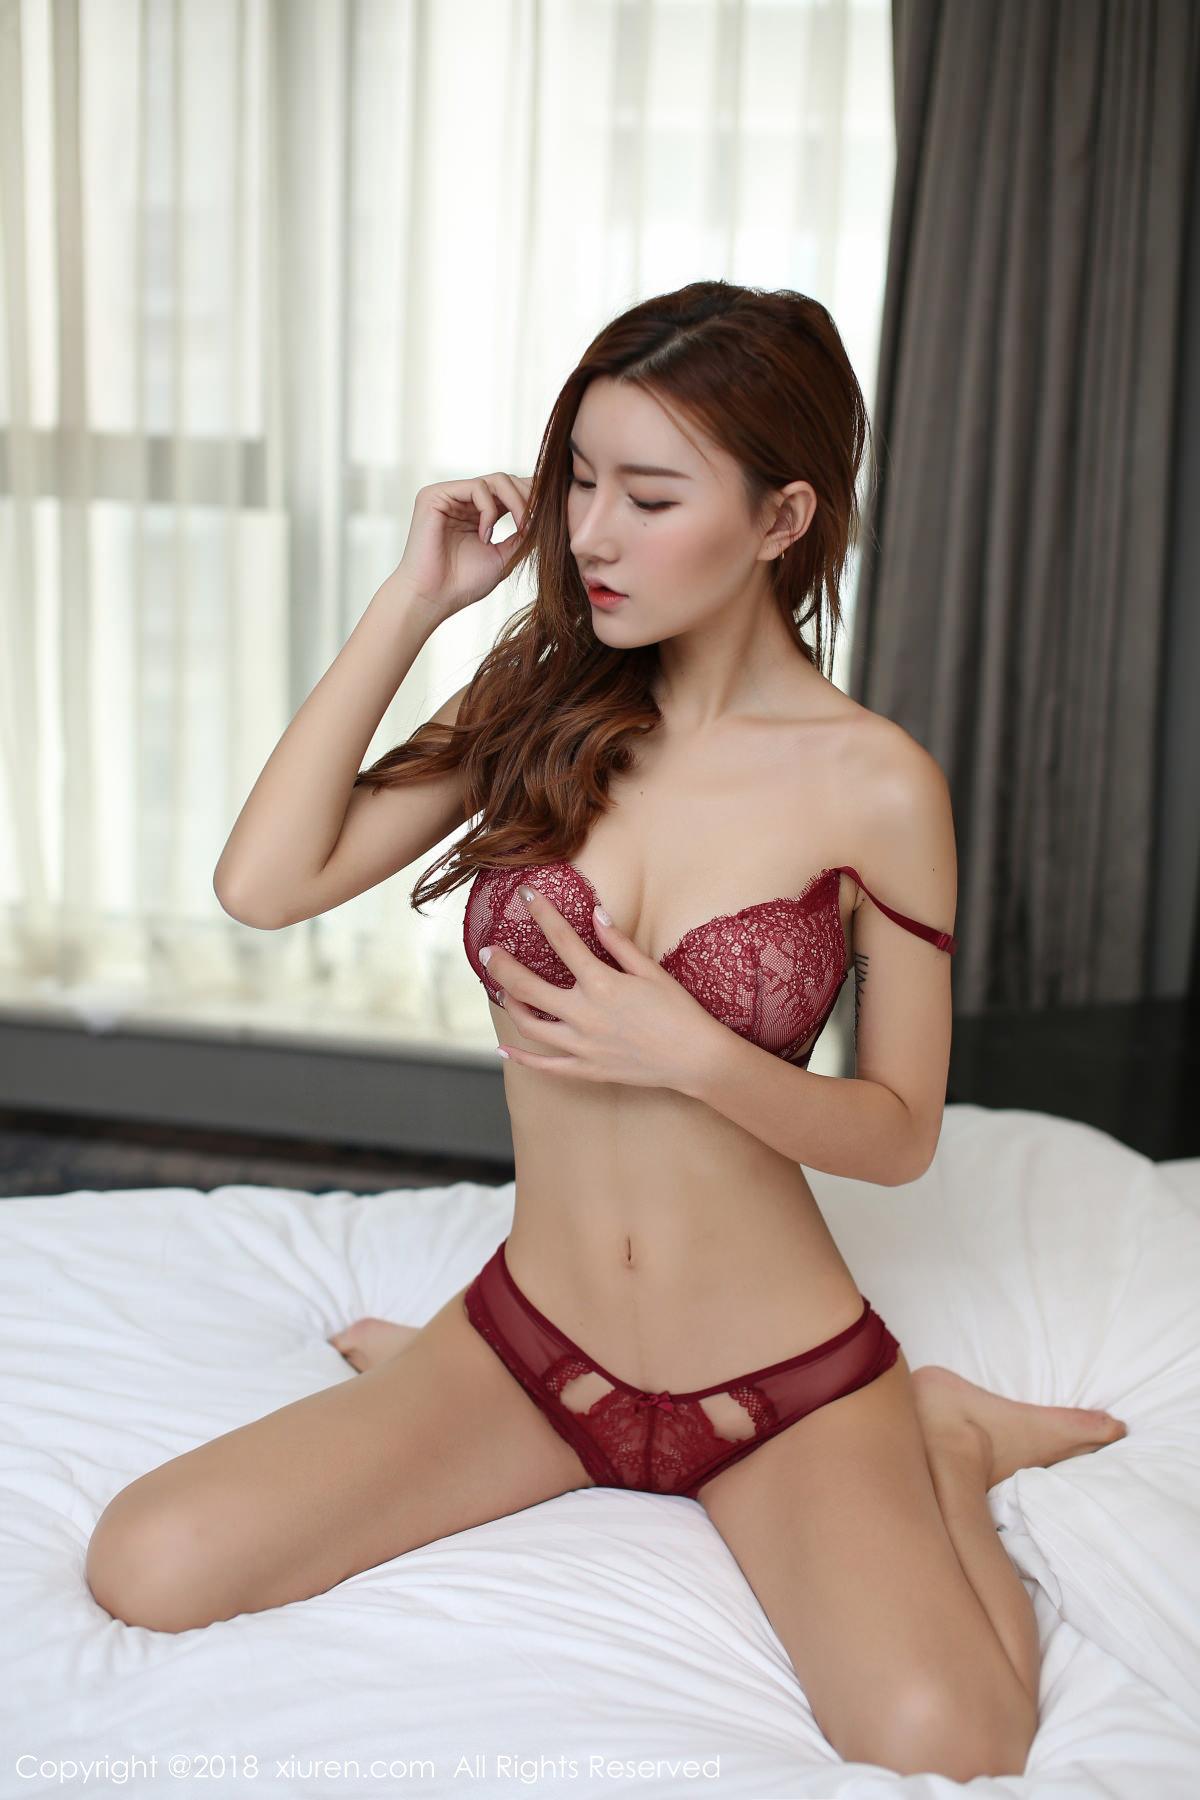 UGIRLS U272: Model Jin Yu Xi (金 禹 熙) (66 pictures)